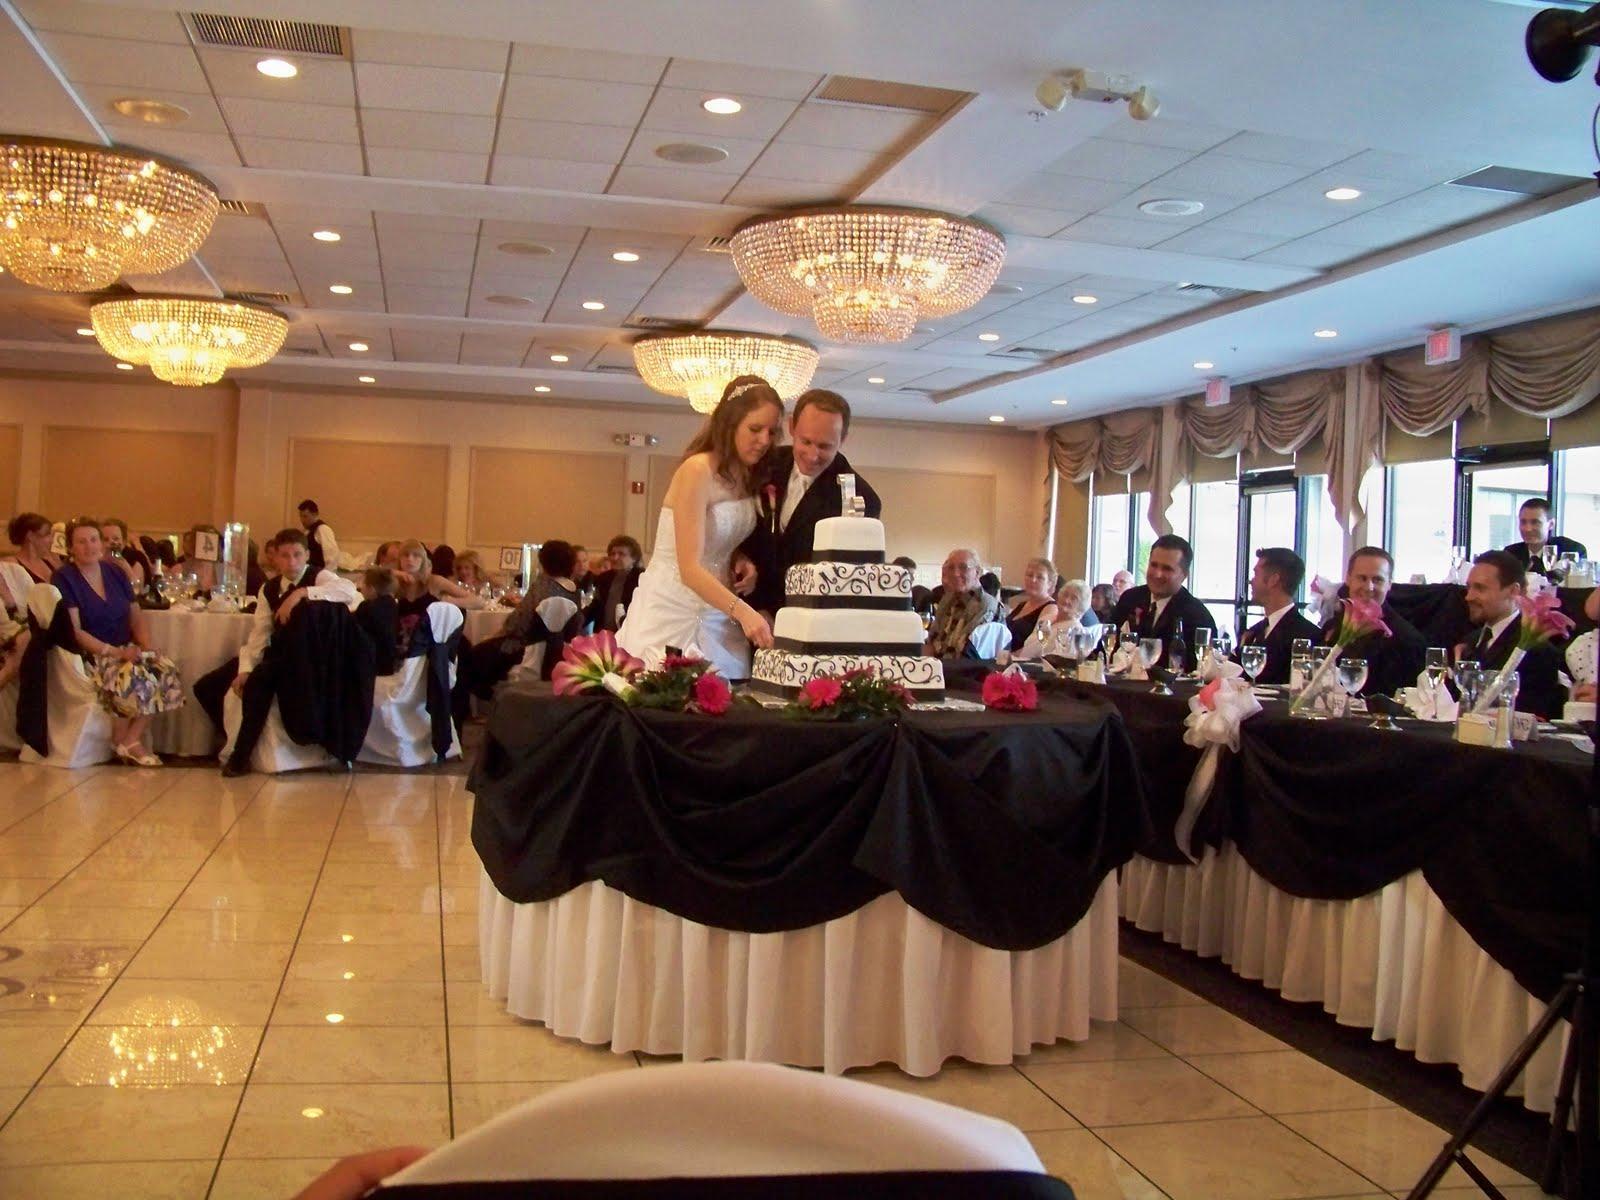 Wedding Day-The Reception!